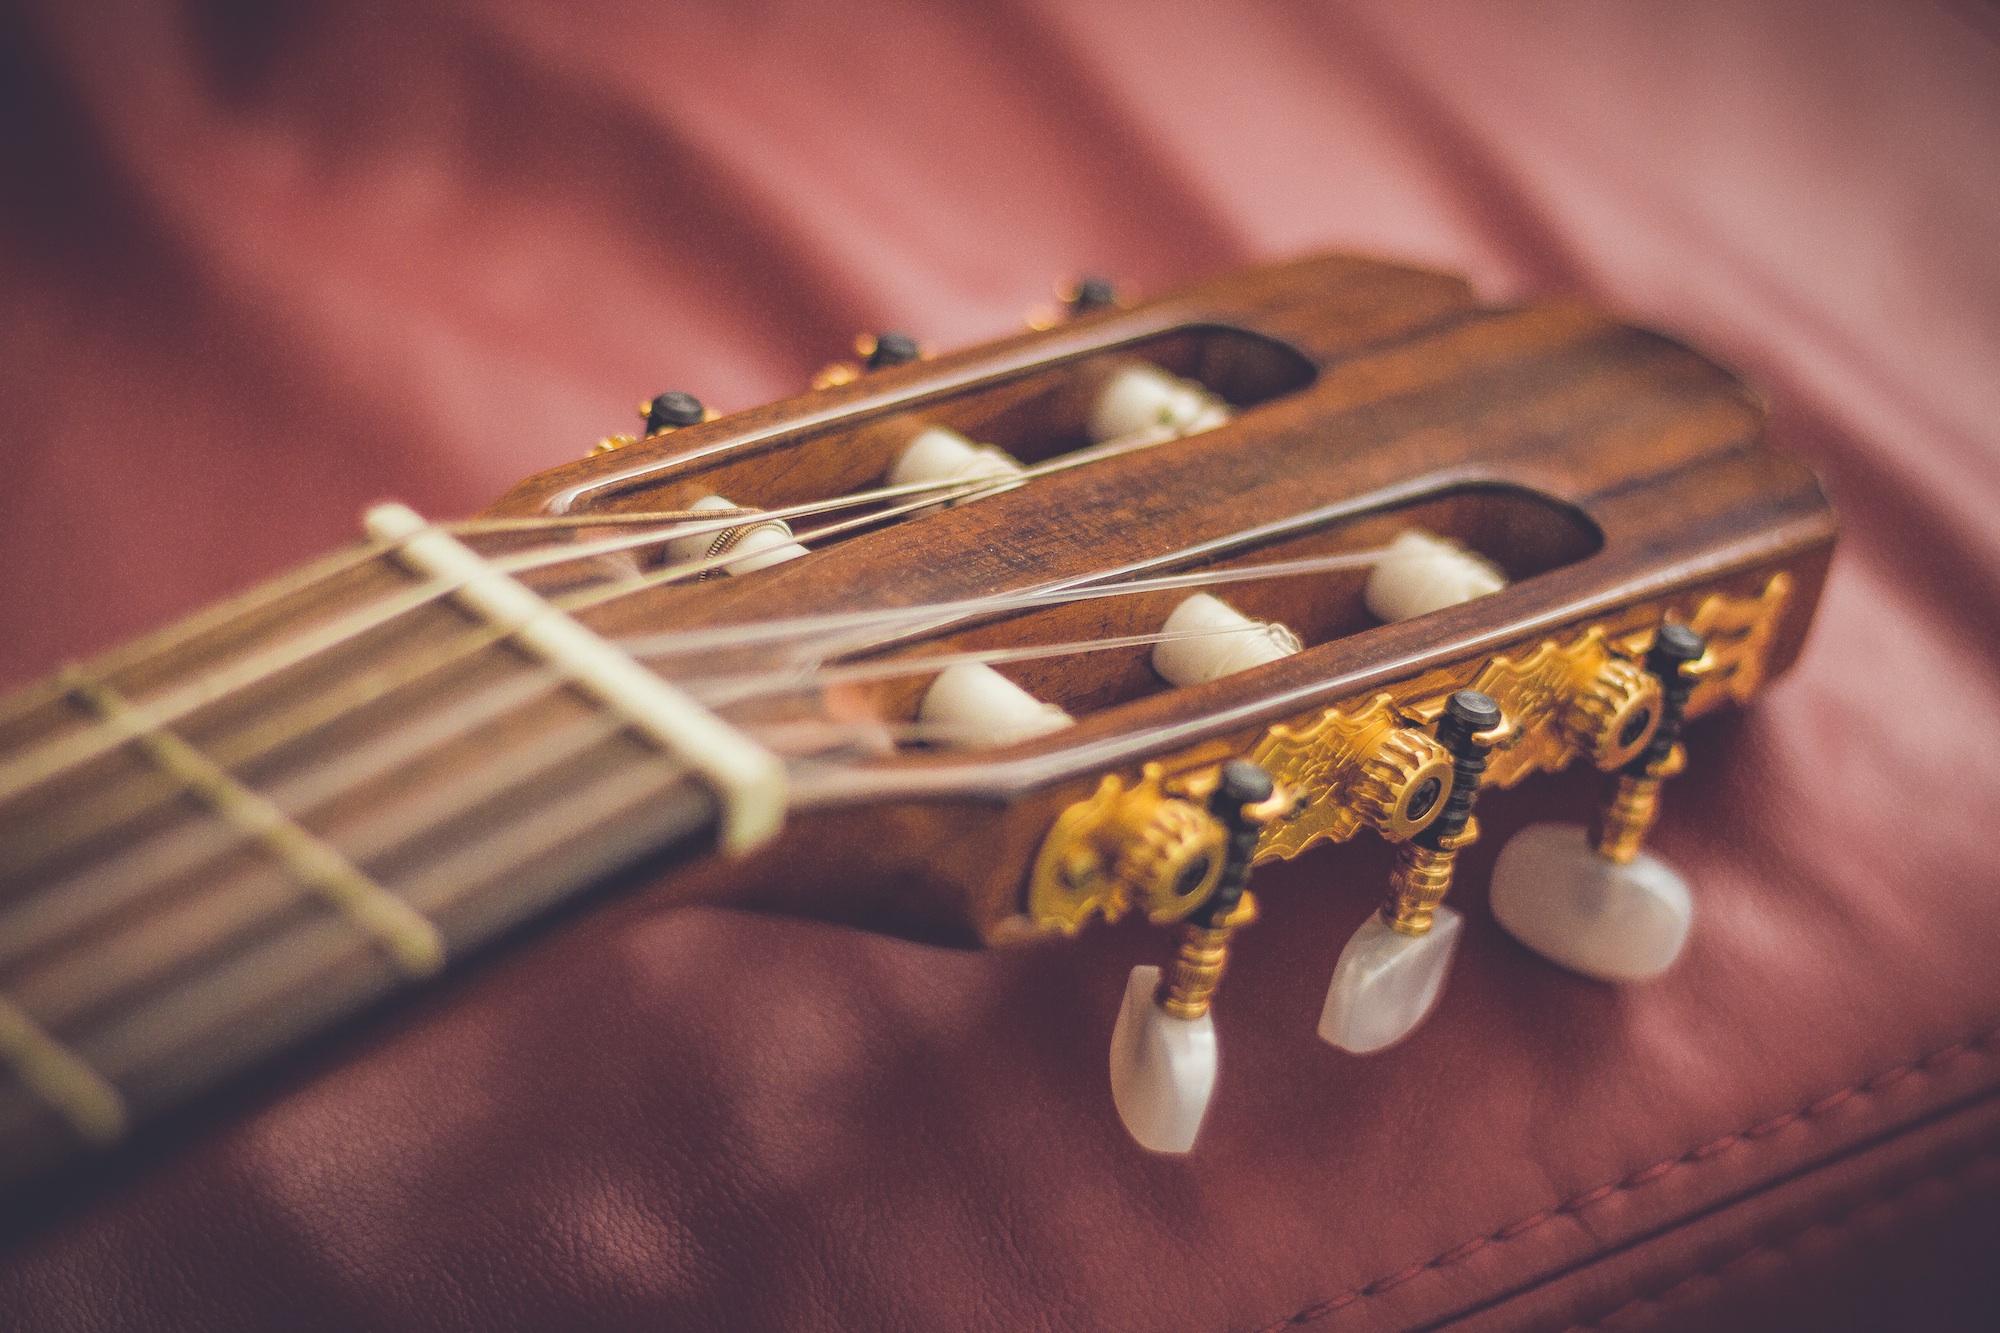 Guitar Acoustic Instrument Musical Close Up Violin Fret Tuning Ukulele Bass Macro Photography